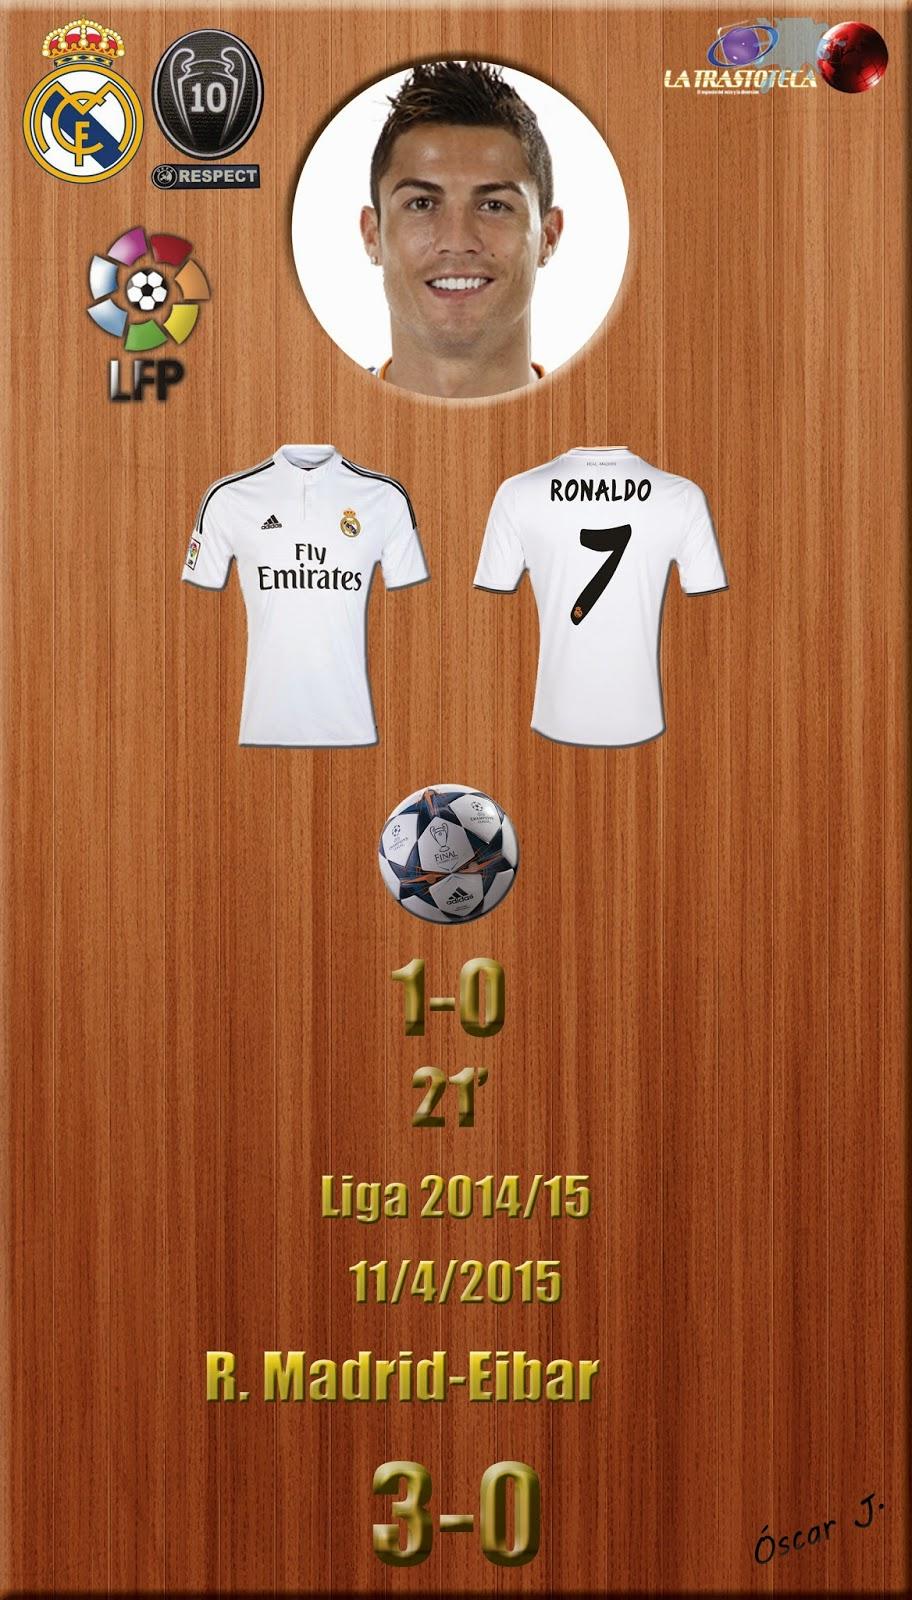 Cristiano Ronaldo (1-0) - Real Madrid 3-0 Eibar - Liga 2014/15 - Jornada 31 - (11/4/2015)